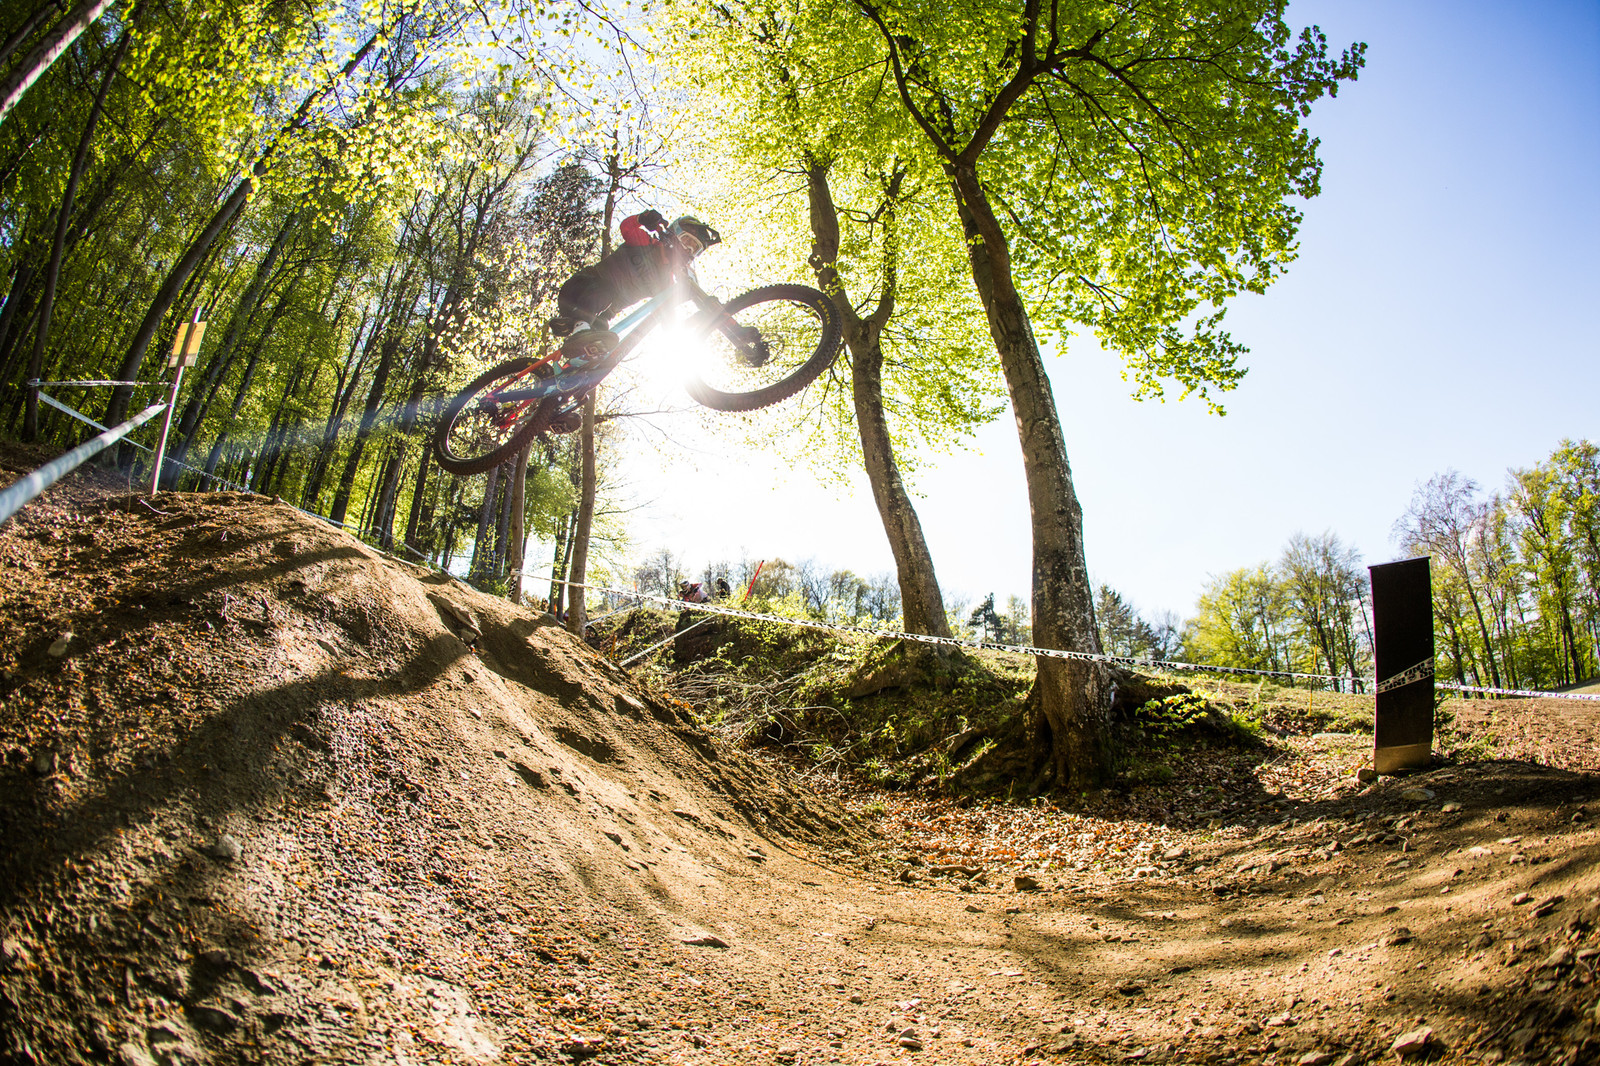 Josh Barth - iXS Downhill Cup Maribor - Race Gallery - Mountain Biking Pictures - Vital MTB